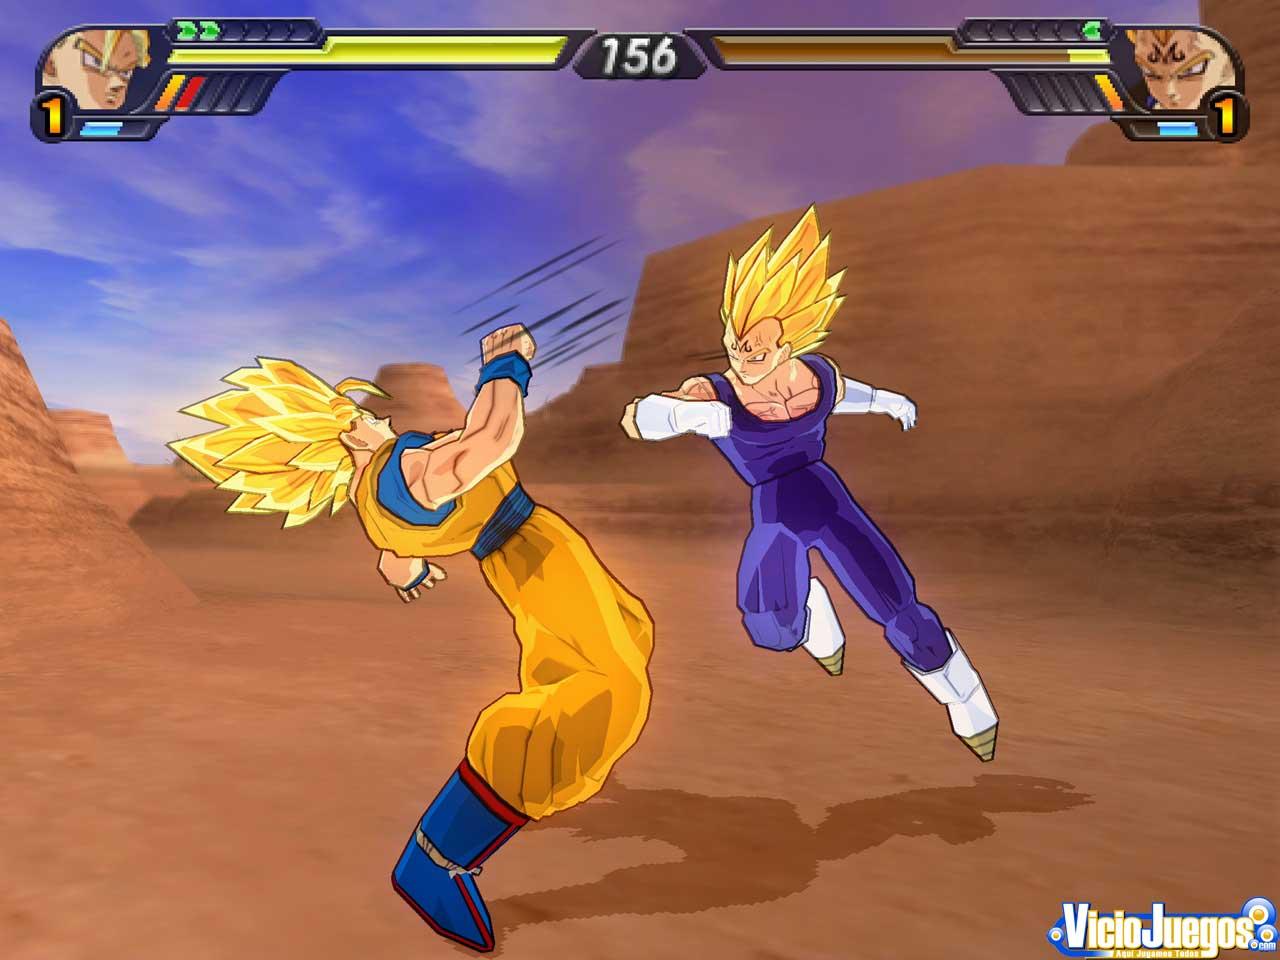 Primer Vistazo: Dragon Ball Z: Budokai Tenkaichi 3